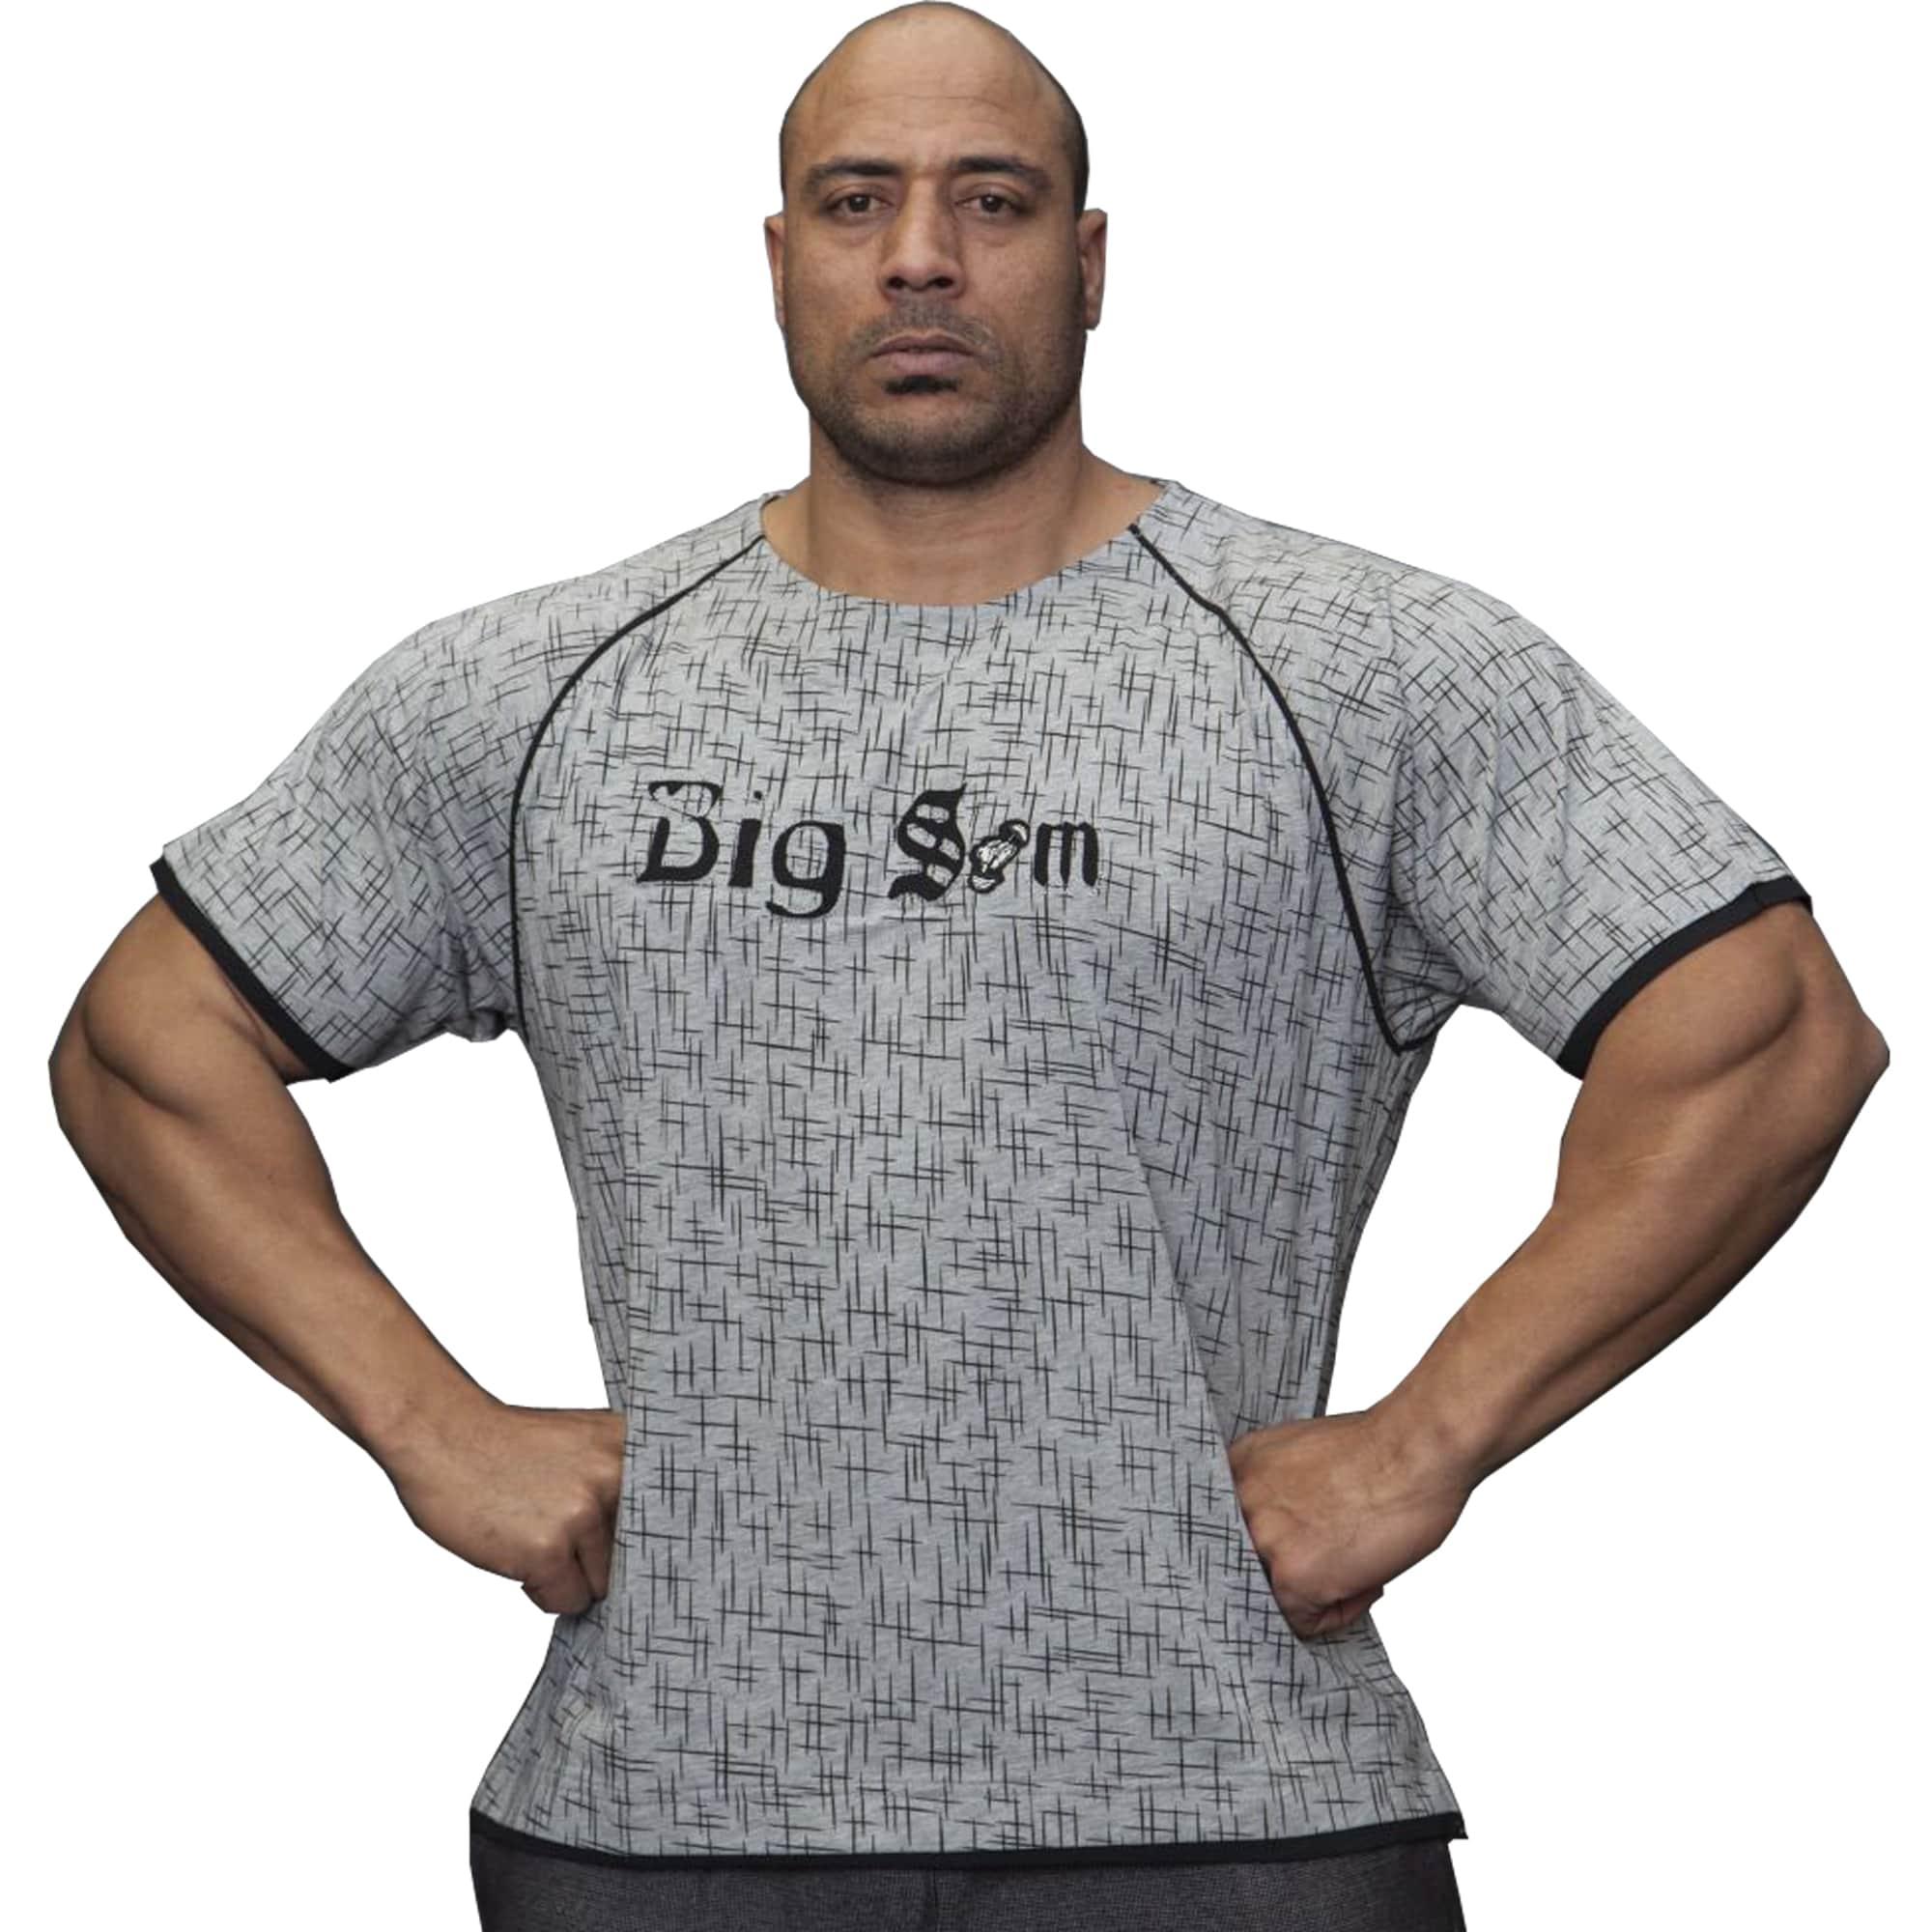 BIG SM EXTREME EXTREME SM SPORTSWEAR Ragtop Rag Top Sweater T-Shirt Bodybuilding  3152 aa21de